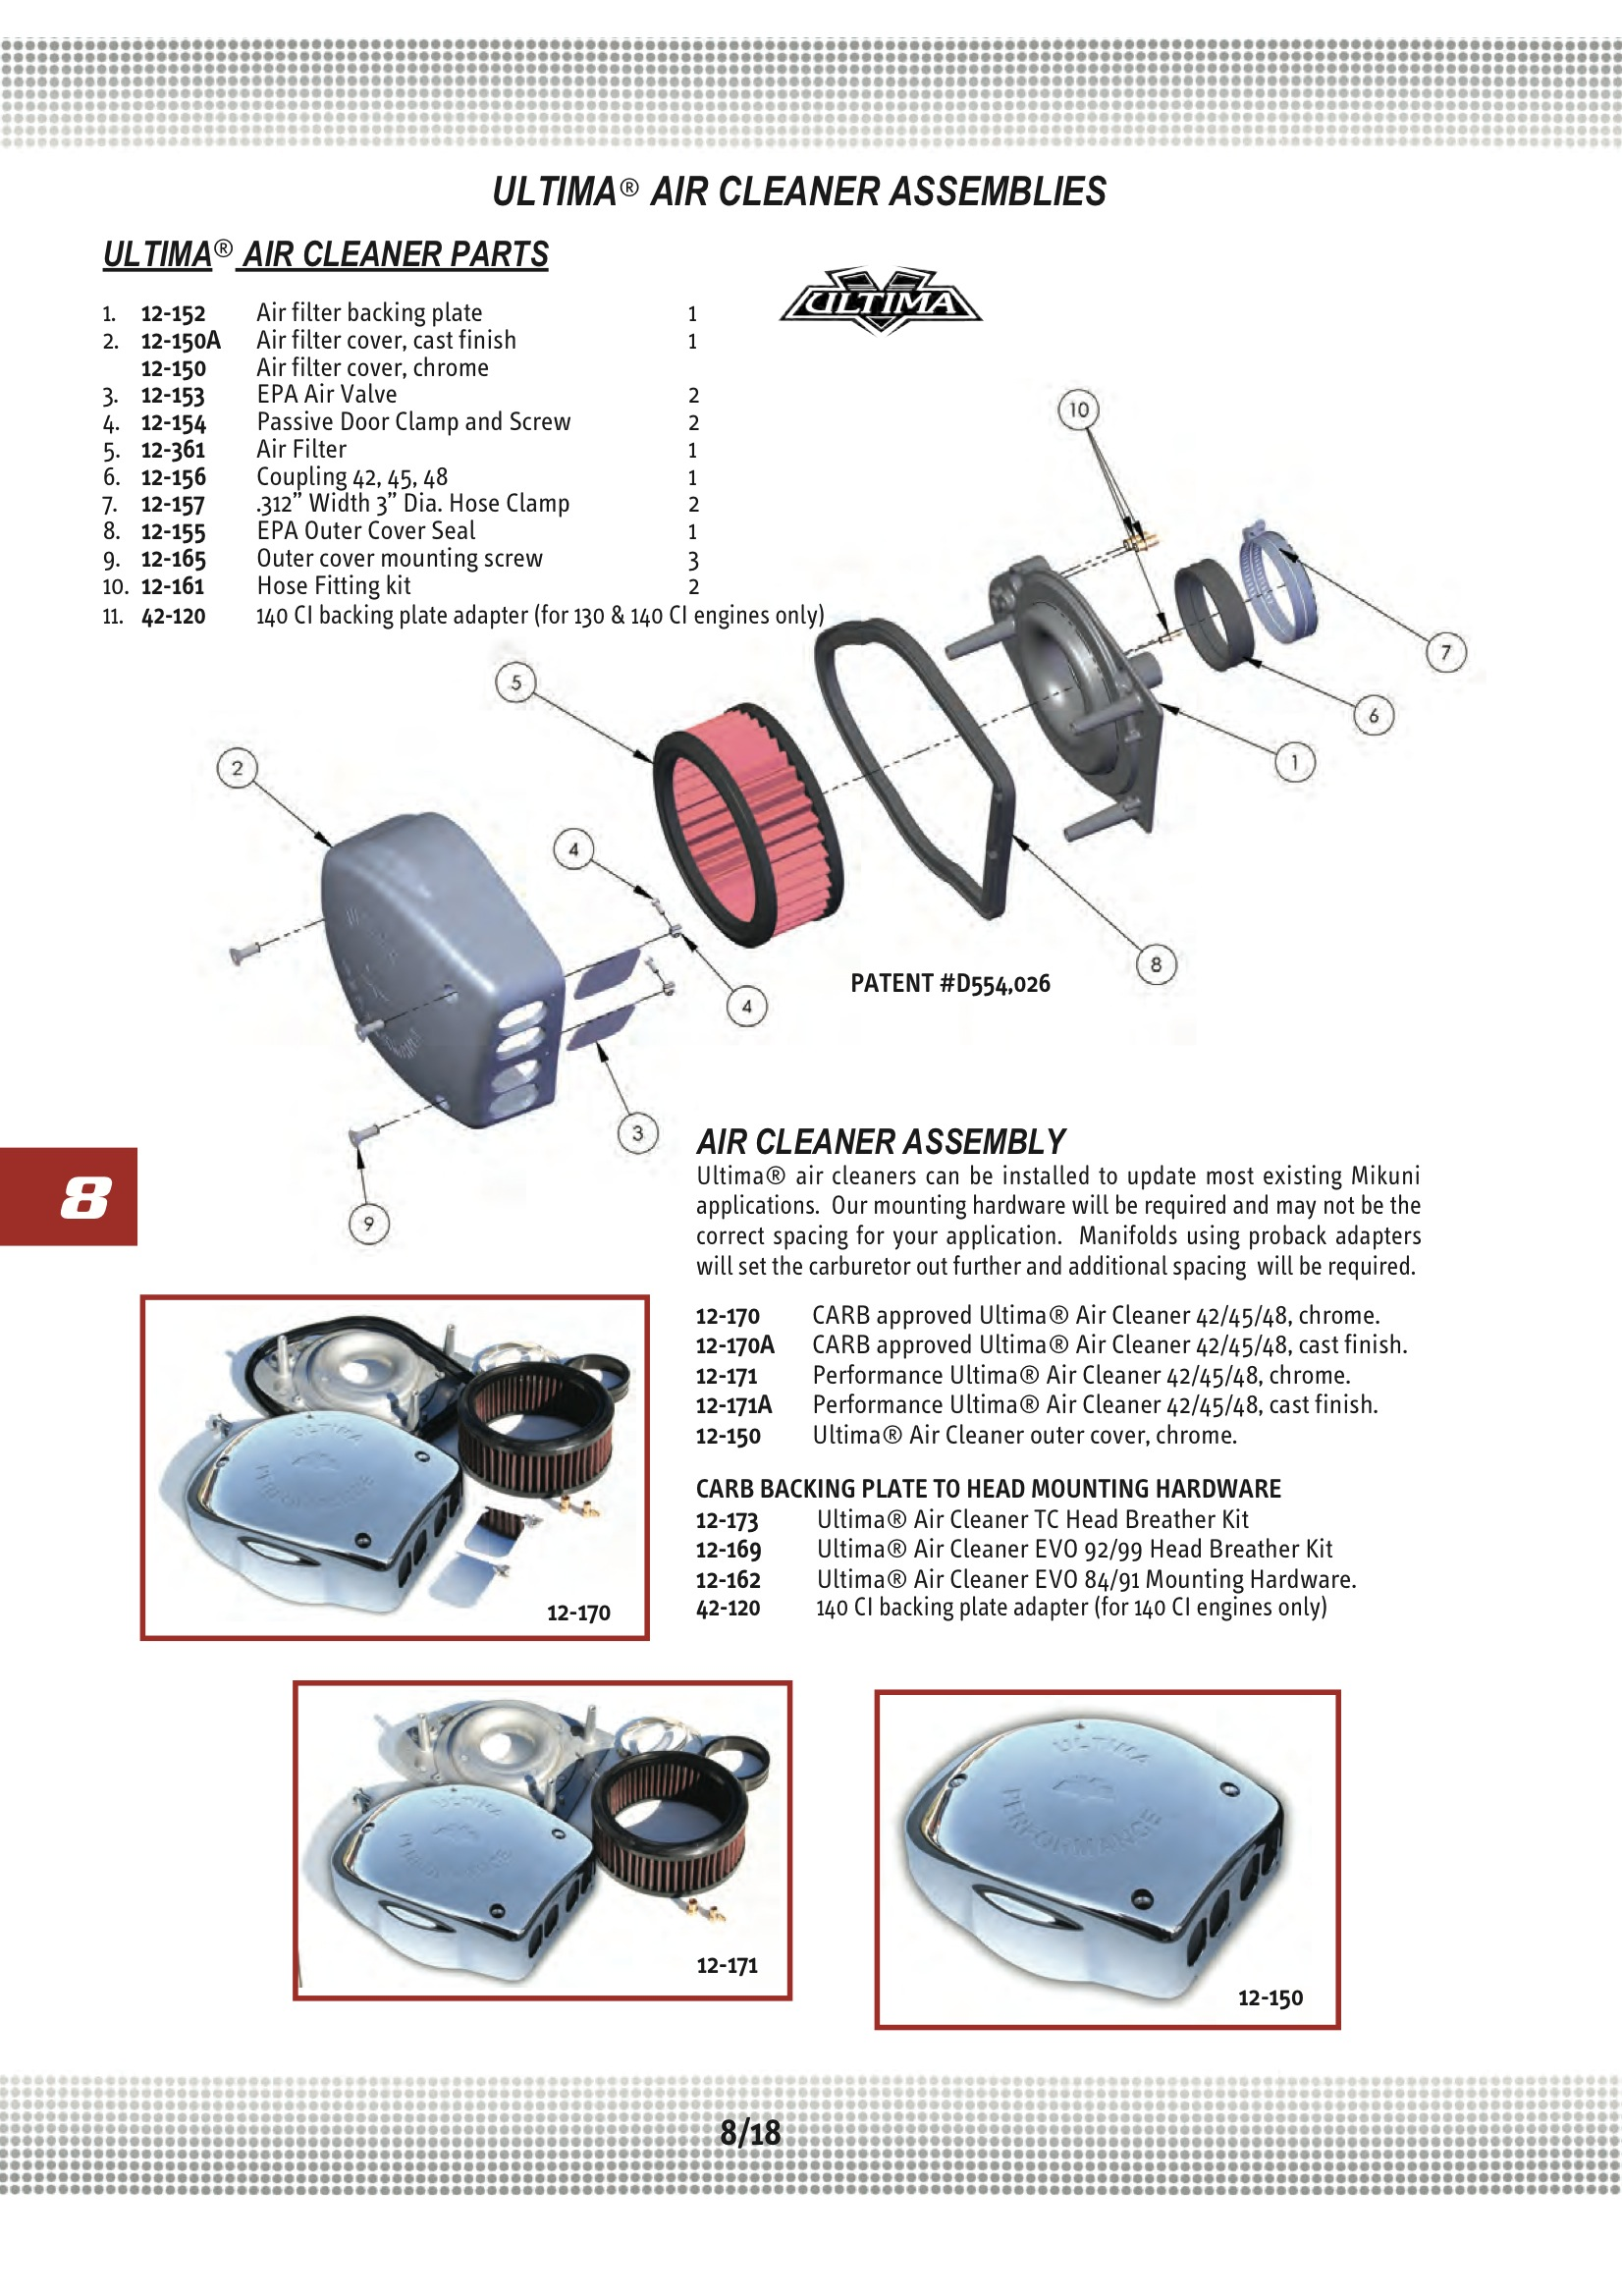 Yamaha Wr426 Wiring Diagram : Yamaha srx wiring diagram sr